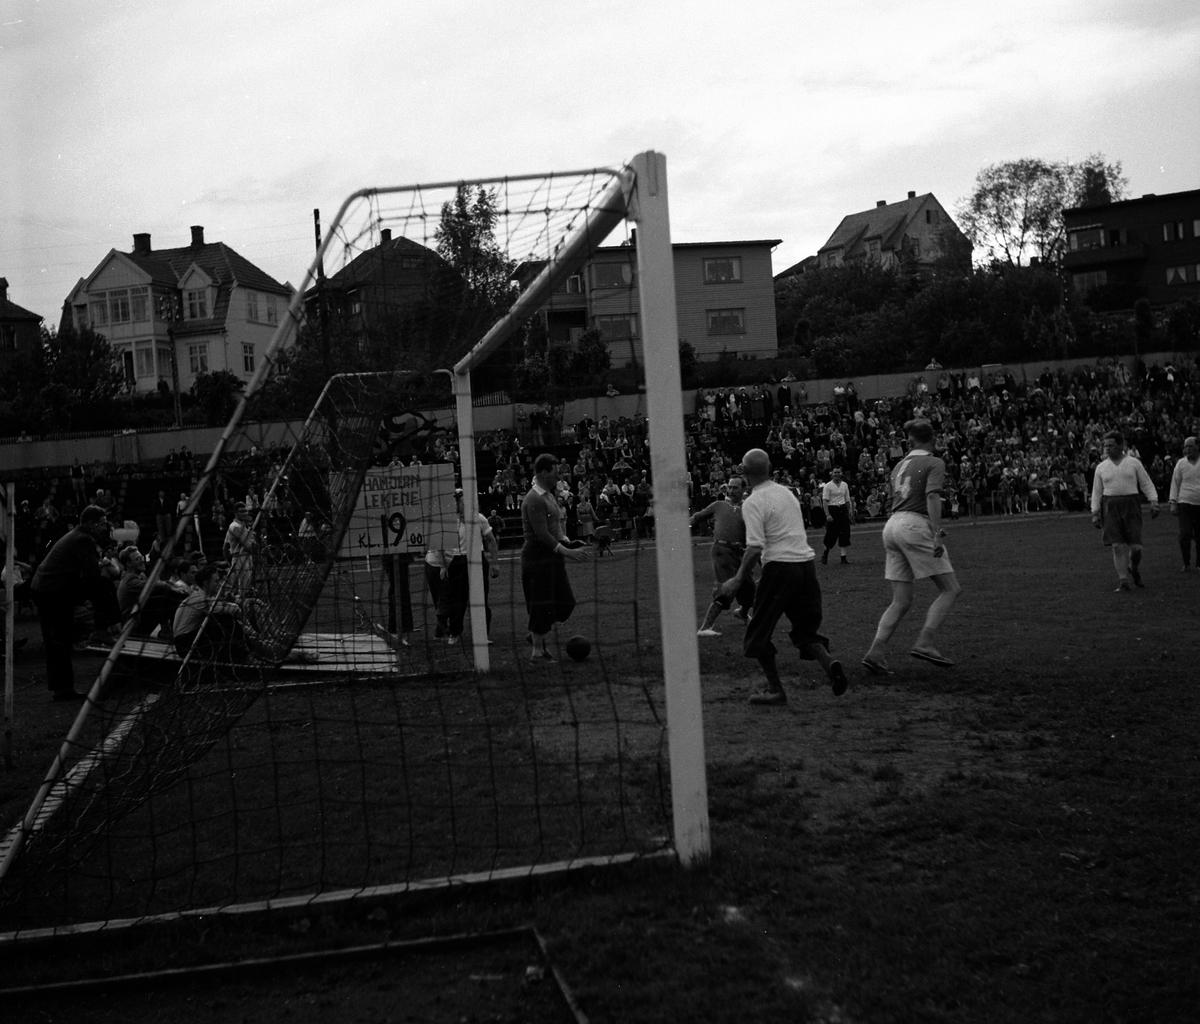 HAMAR JERNSTØPERI OG MEK. VERKSTED, HAM-JERN, HAM-JERNLEKENE 1952, FOTBALLKAMP, HAMAR STADION,